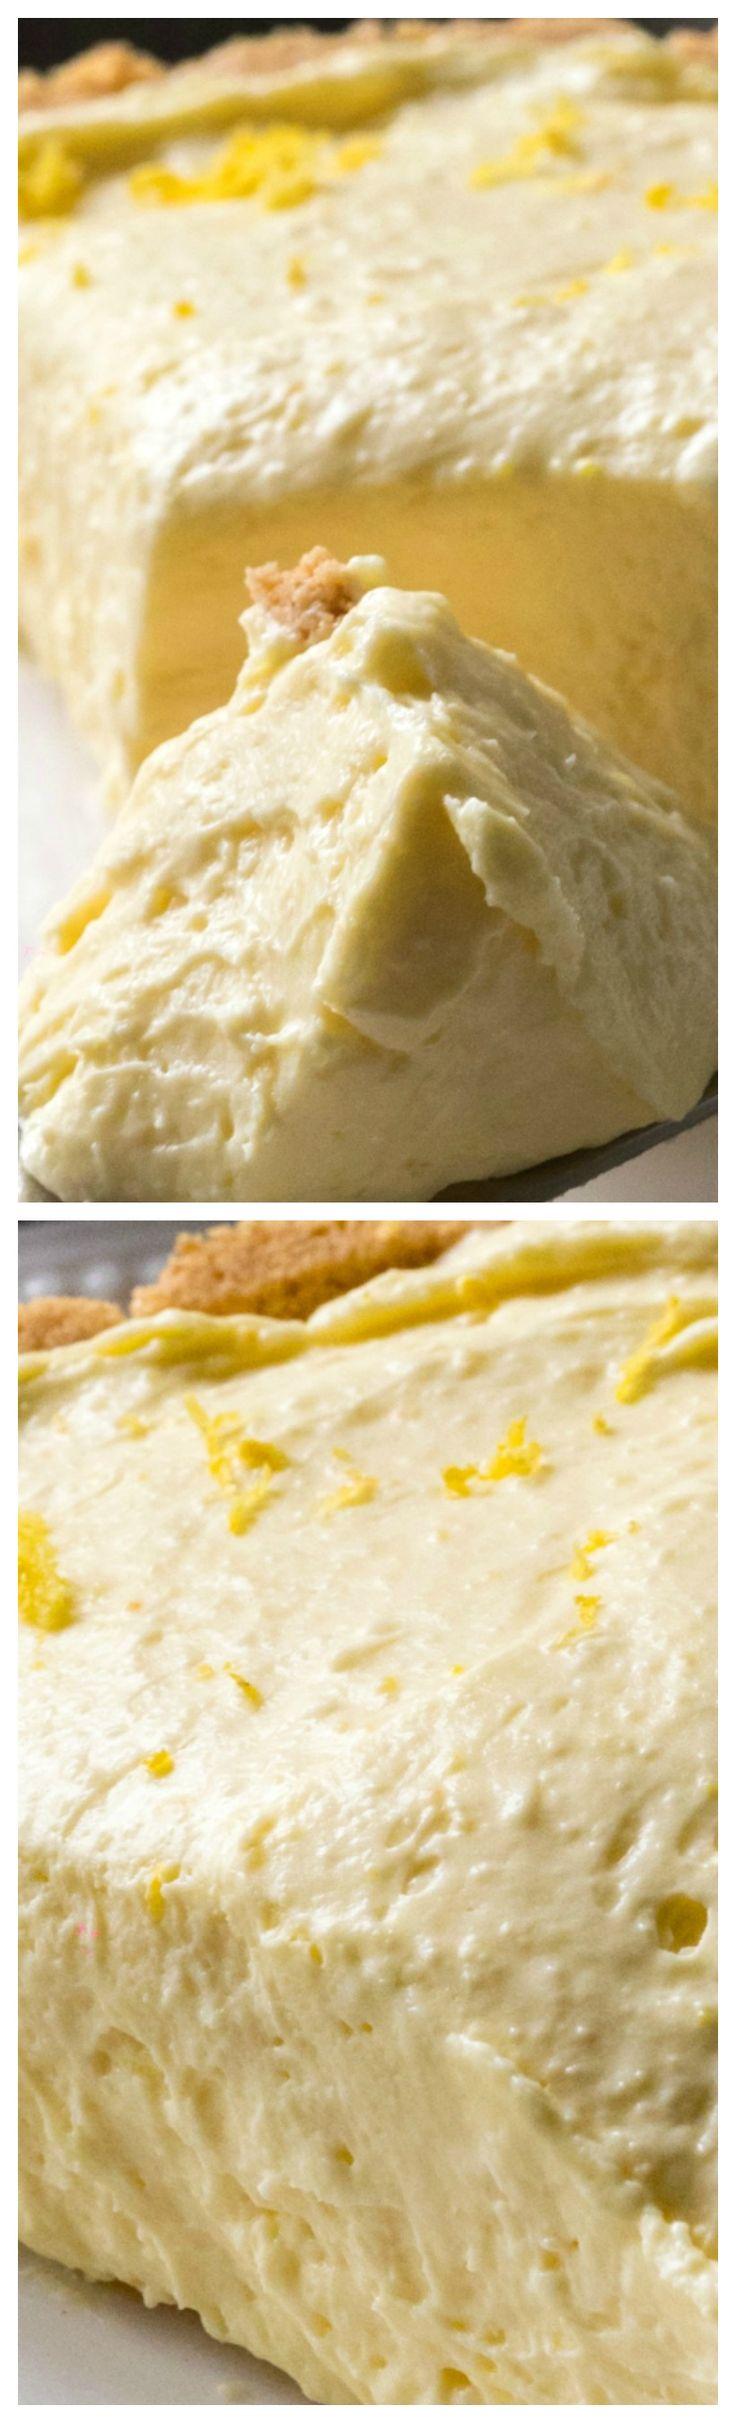 Best 25 cream cheese lemonade pie ideas on pinterest lemon pudding pie recipe lemonade - Lemonade recipes popular less known ...